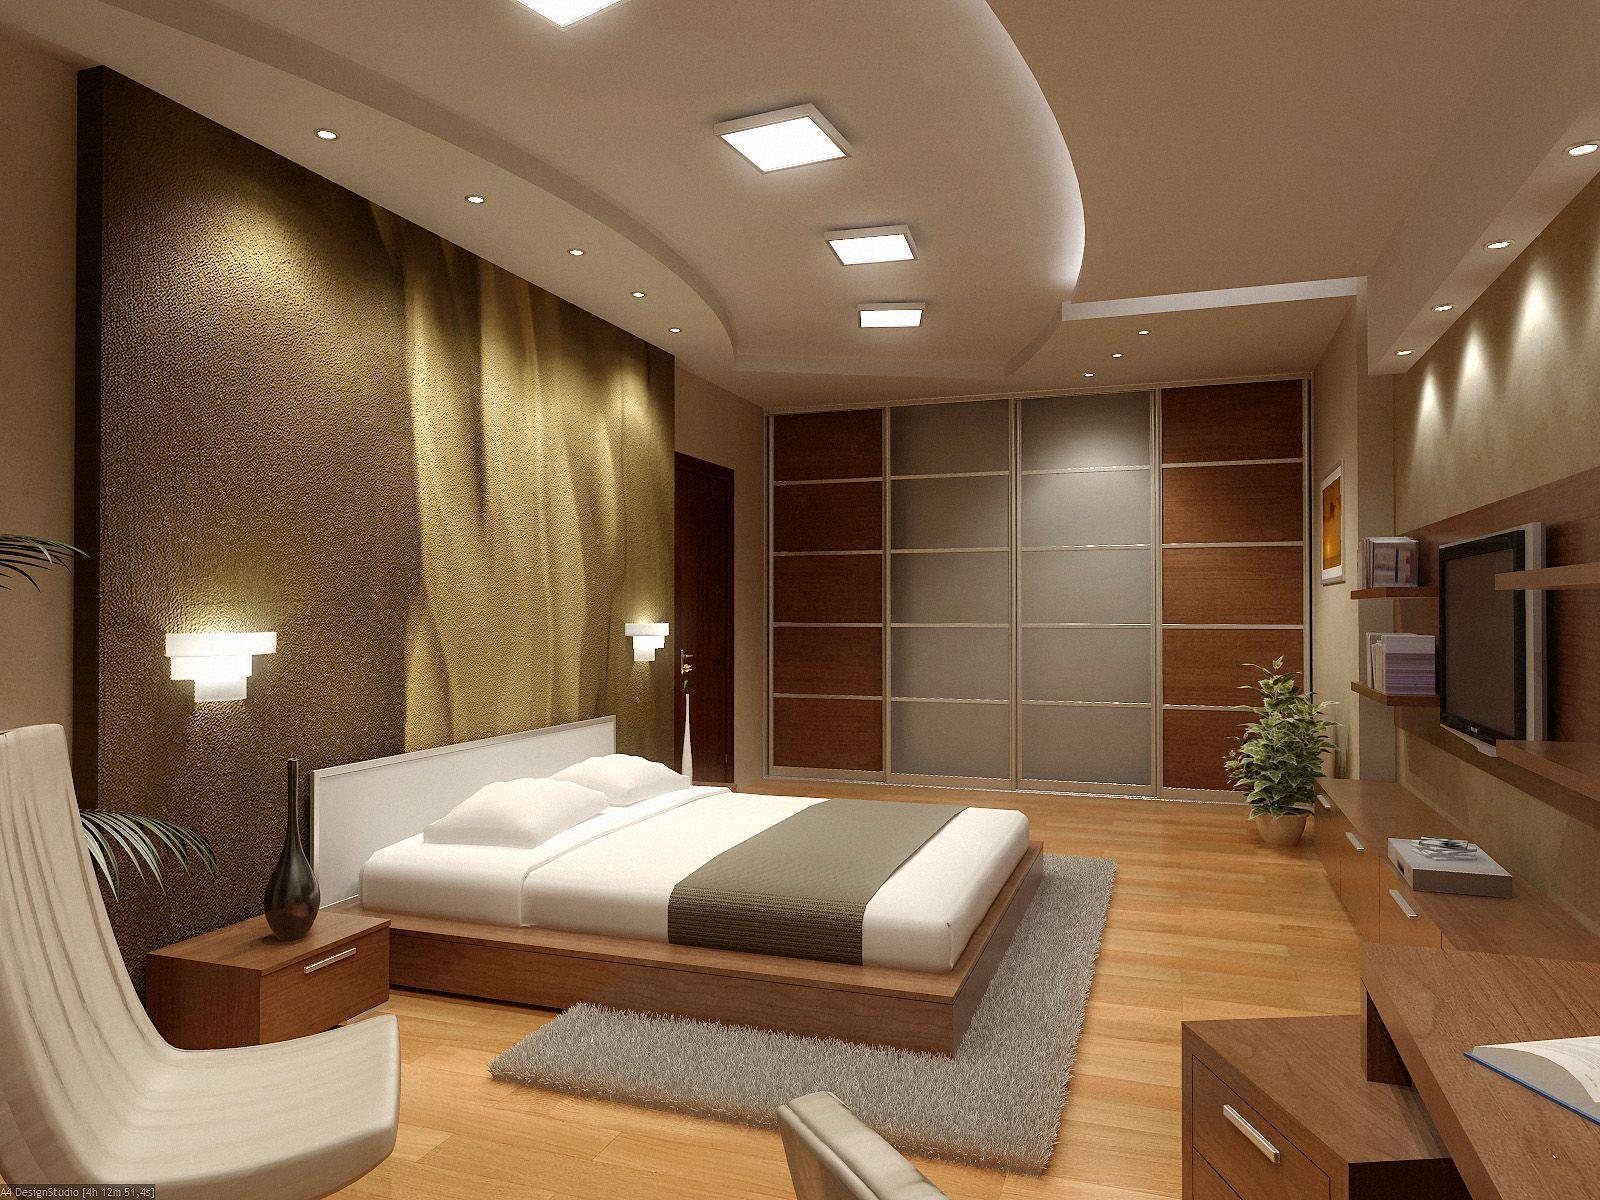 Living Room Designer Rooms Ideas 1000 images about elegant design room 3d online free ideas on pinterest and sofa set